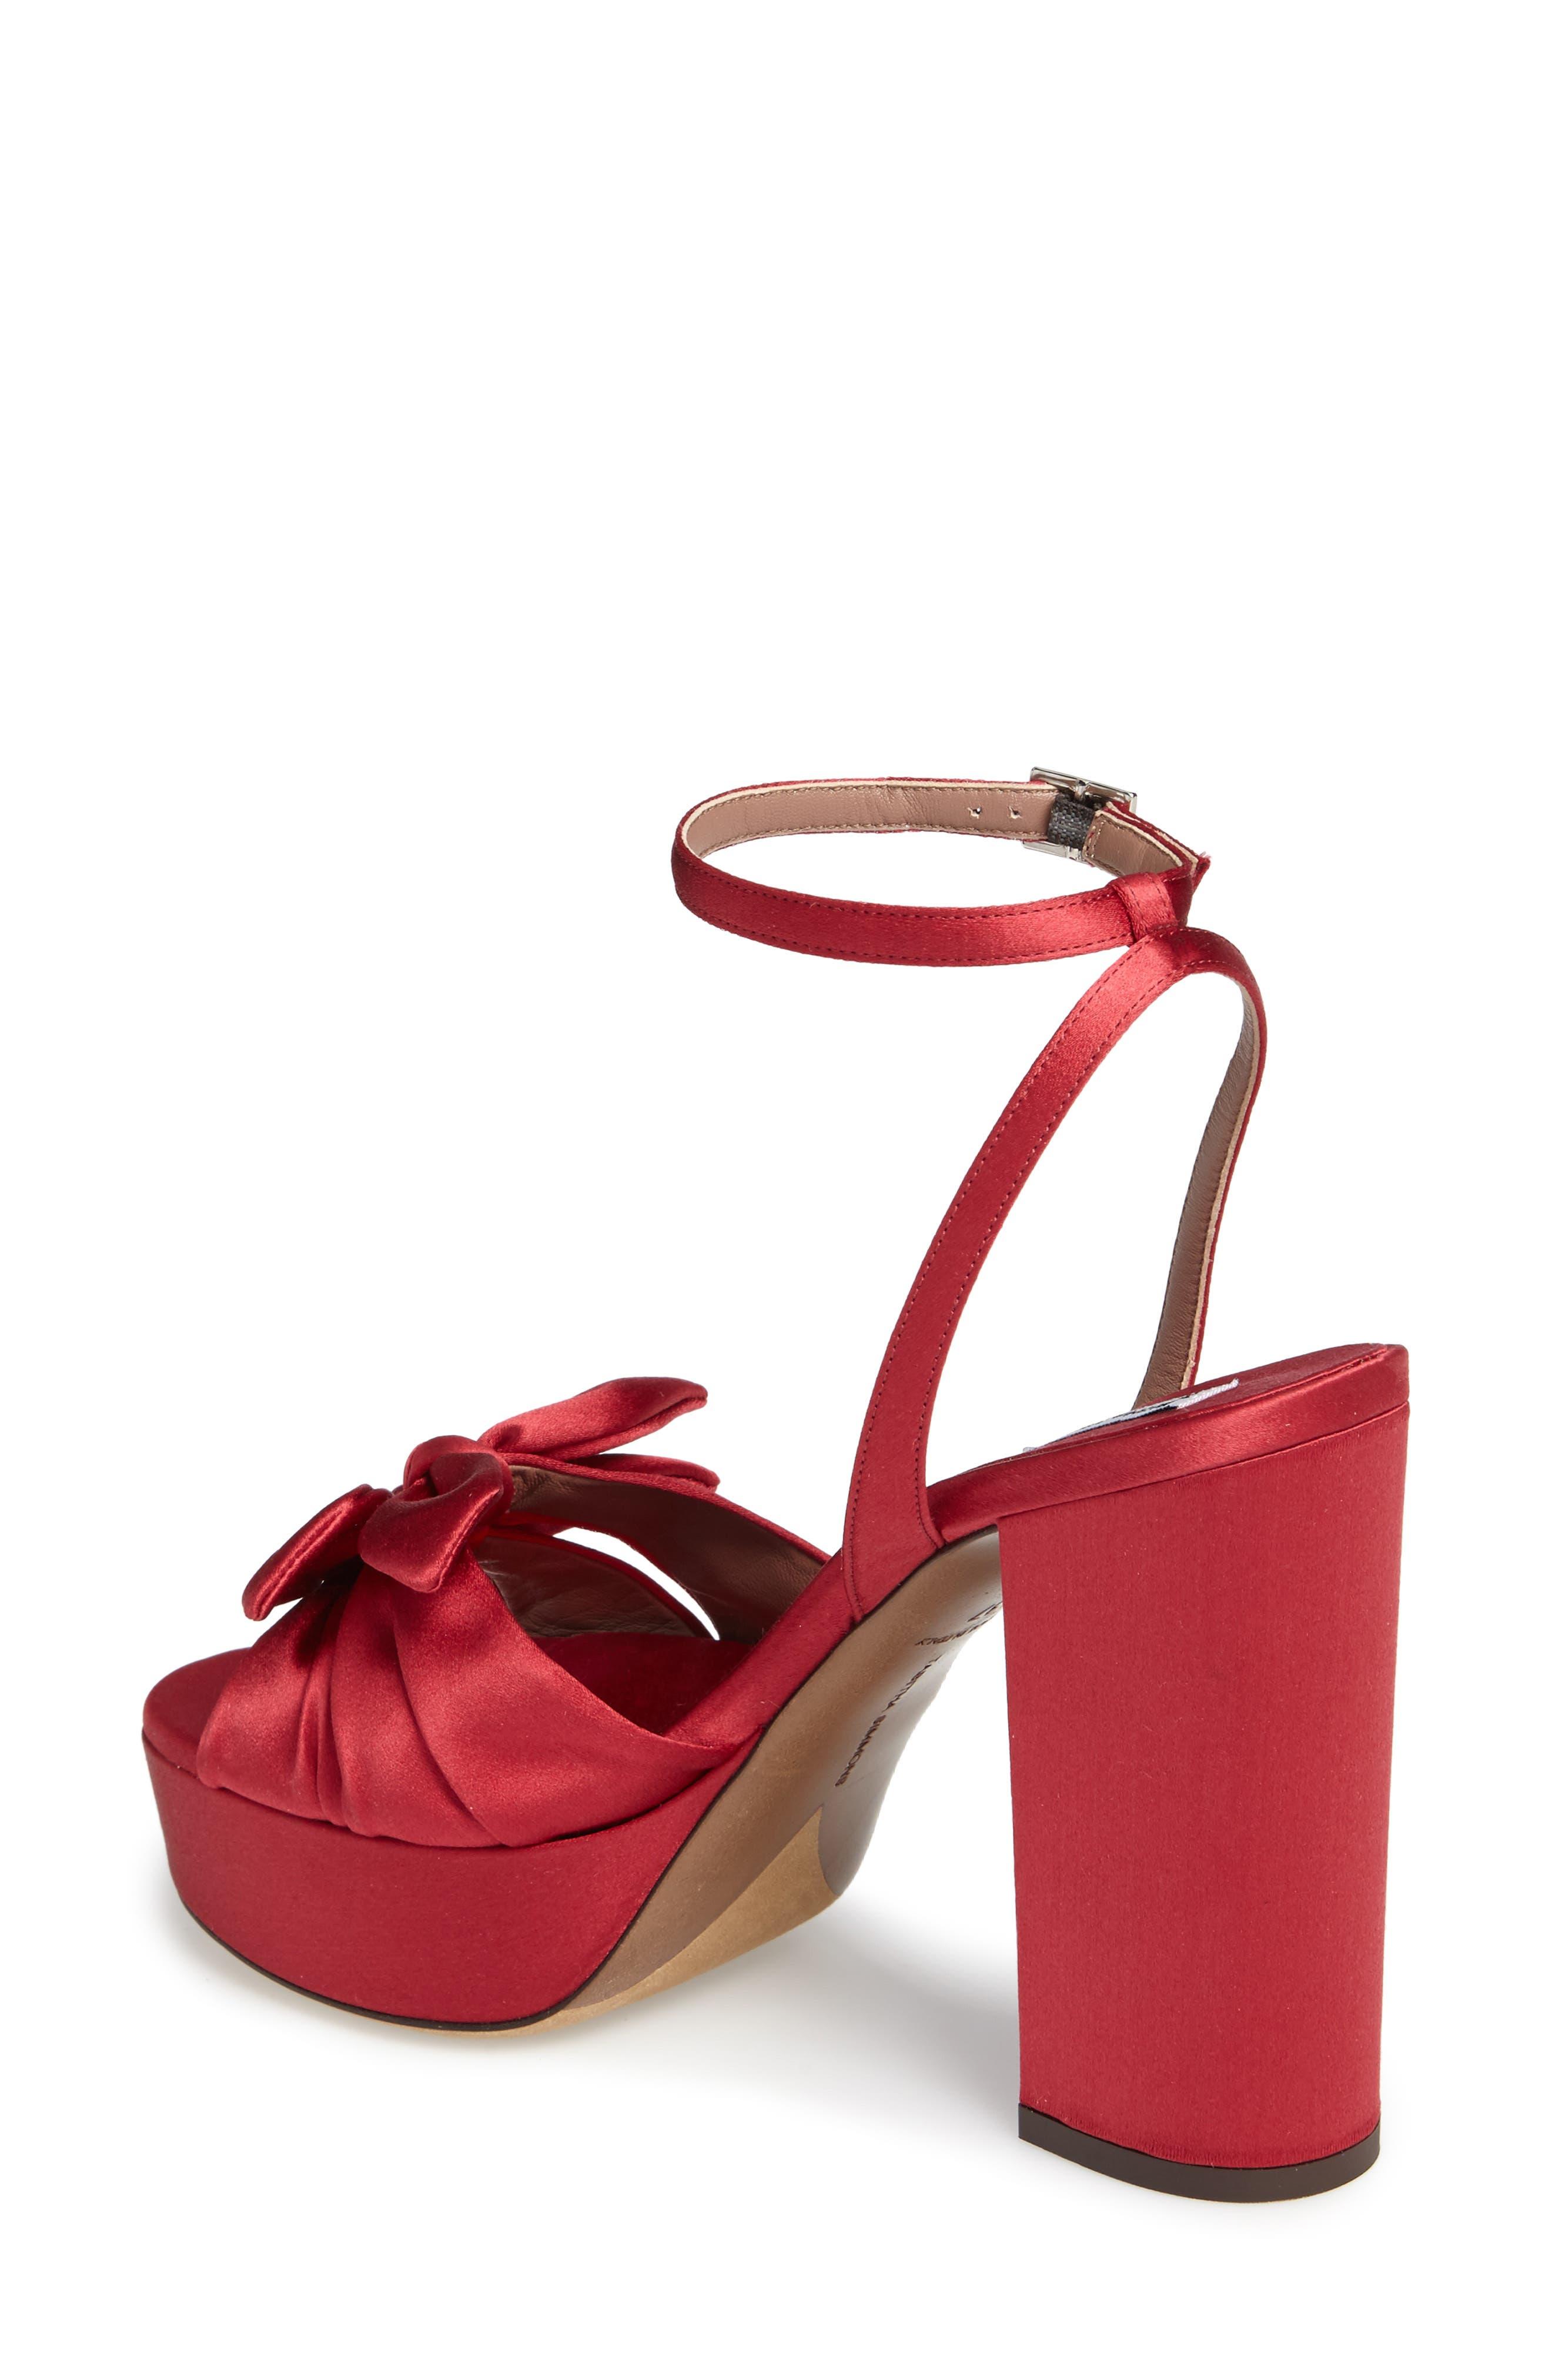 Jodie Platform Sandal,                             Alternate thumbnail 2, color,                             Red